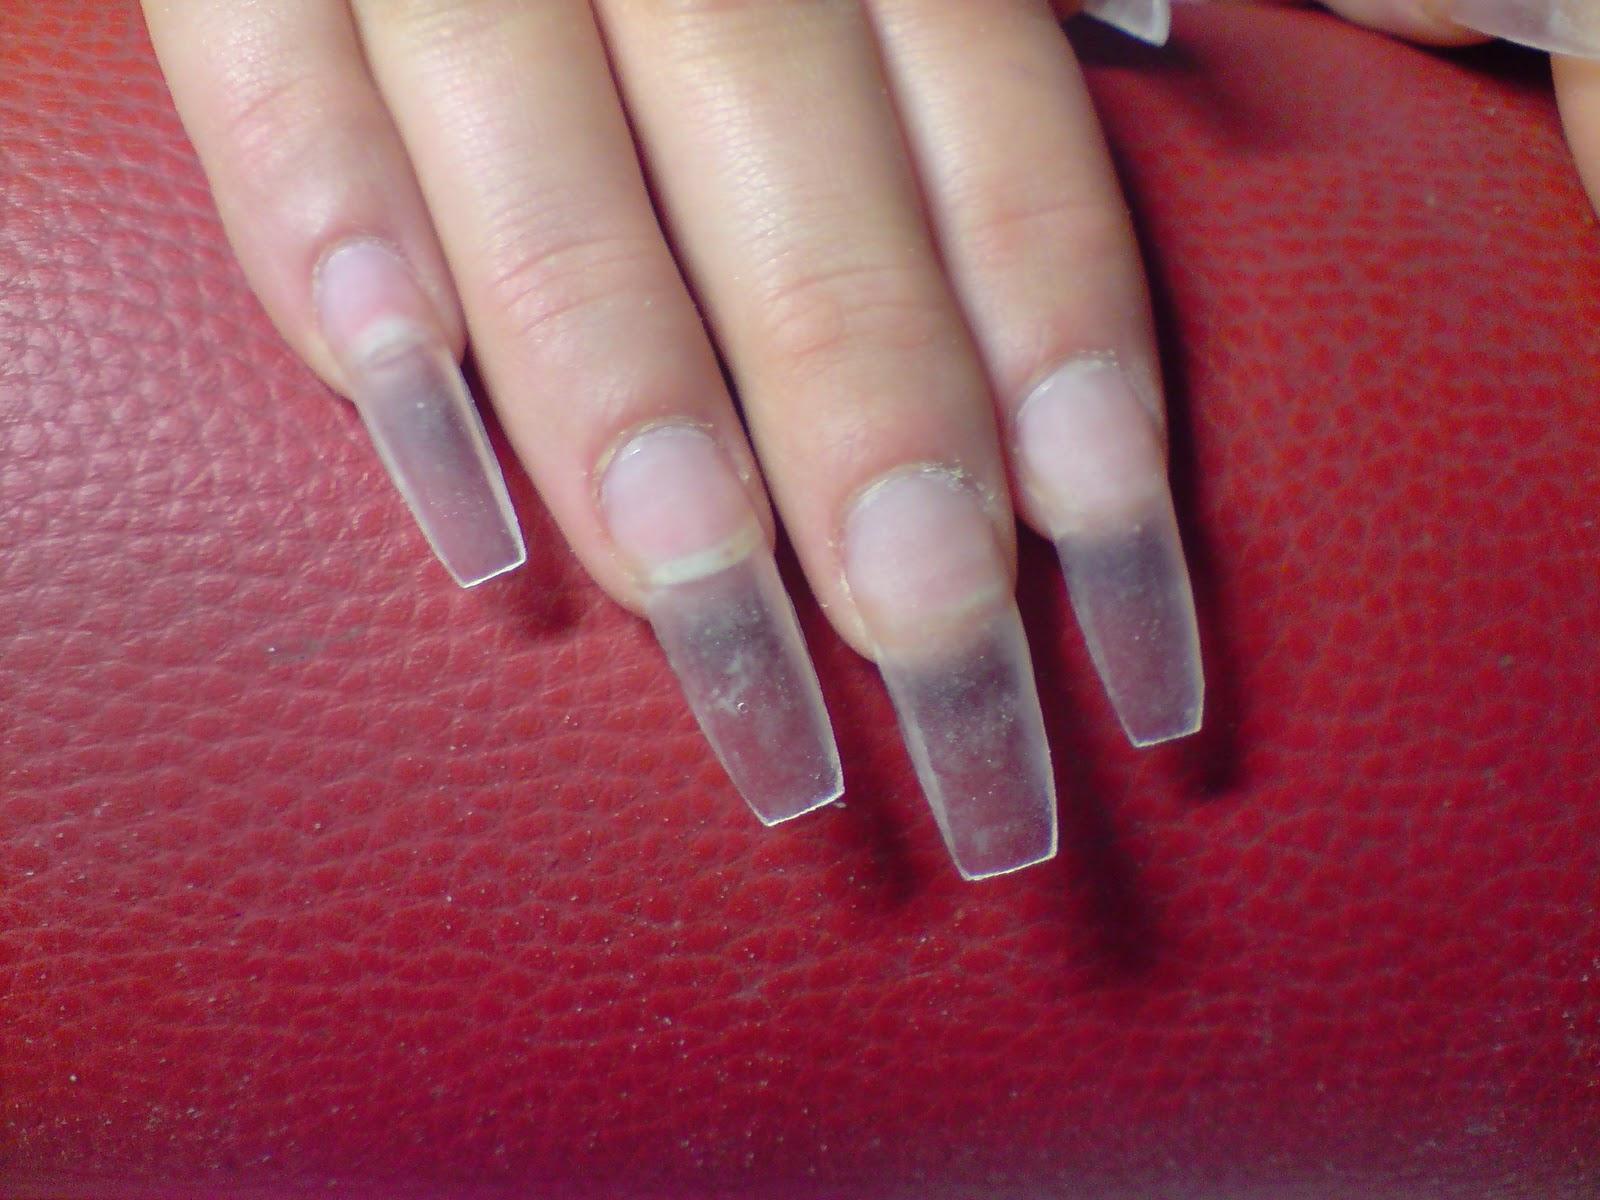 Nails By Mln 90210 Stycznia 2012